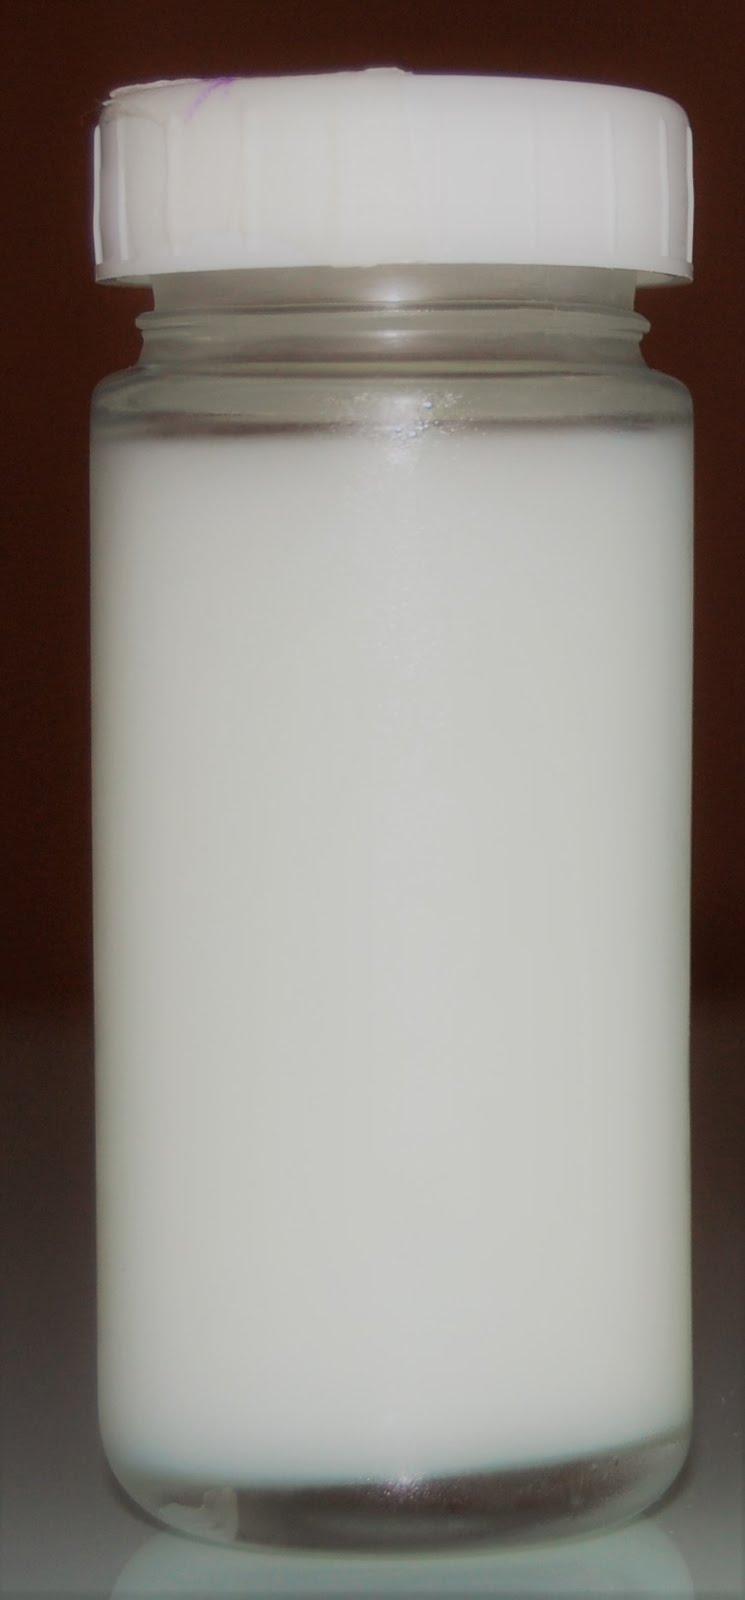 Doe o leite que sobrar!!!